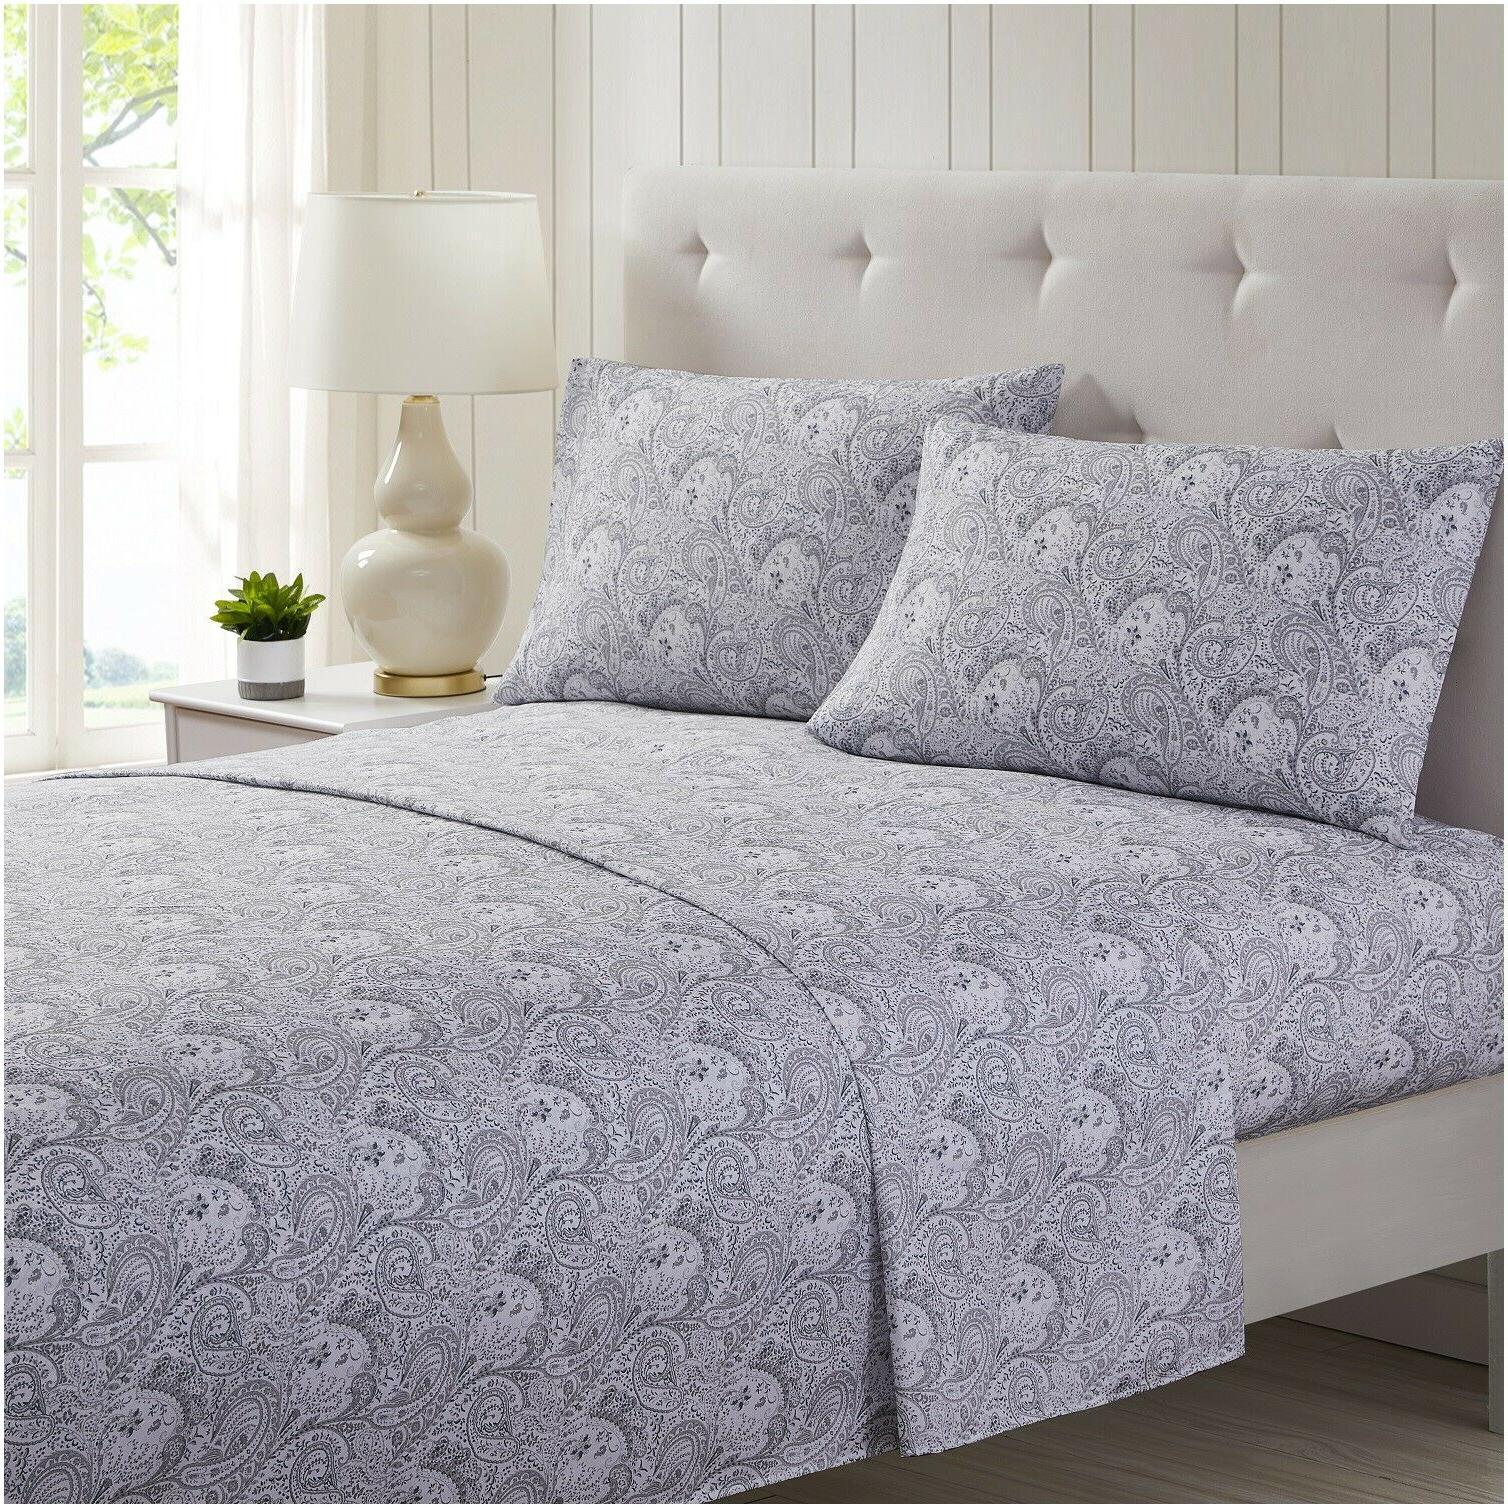 Mellanni 4-Piece Bed Set 1800